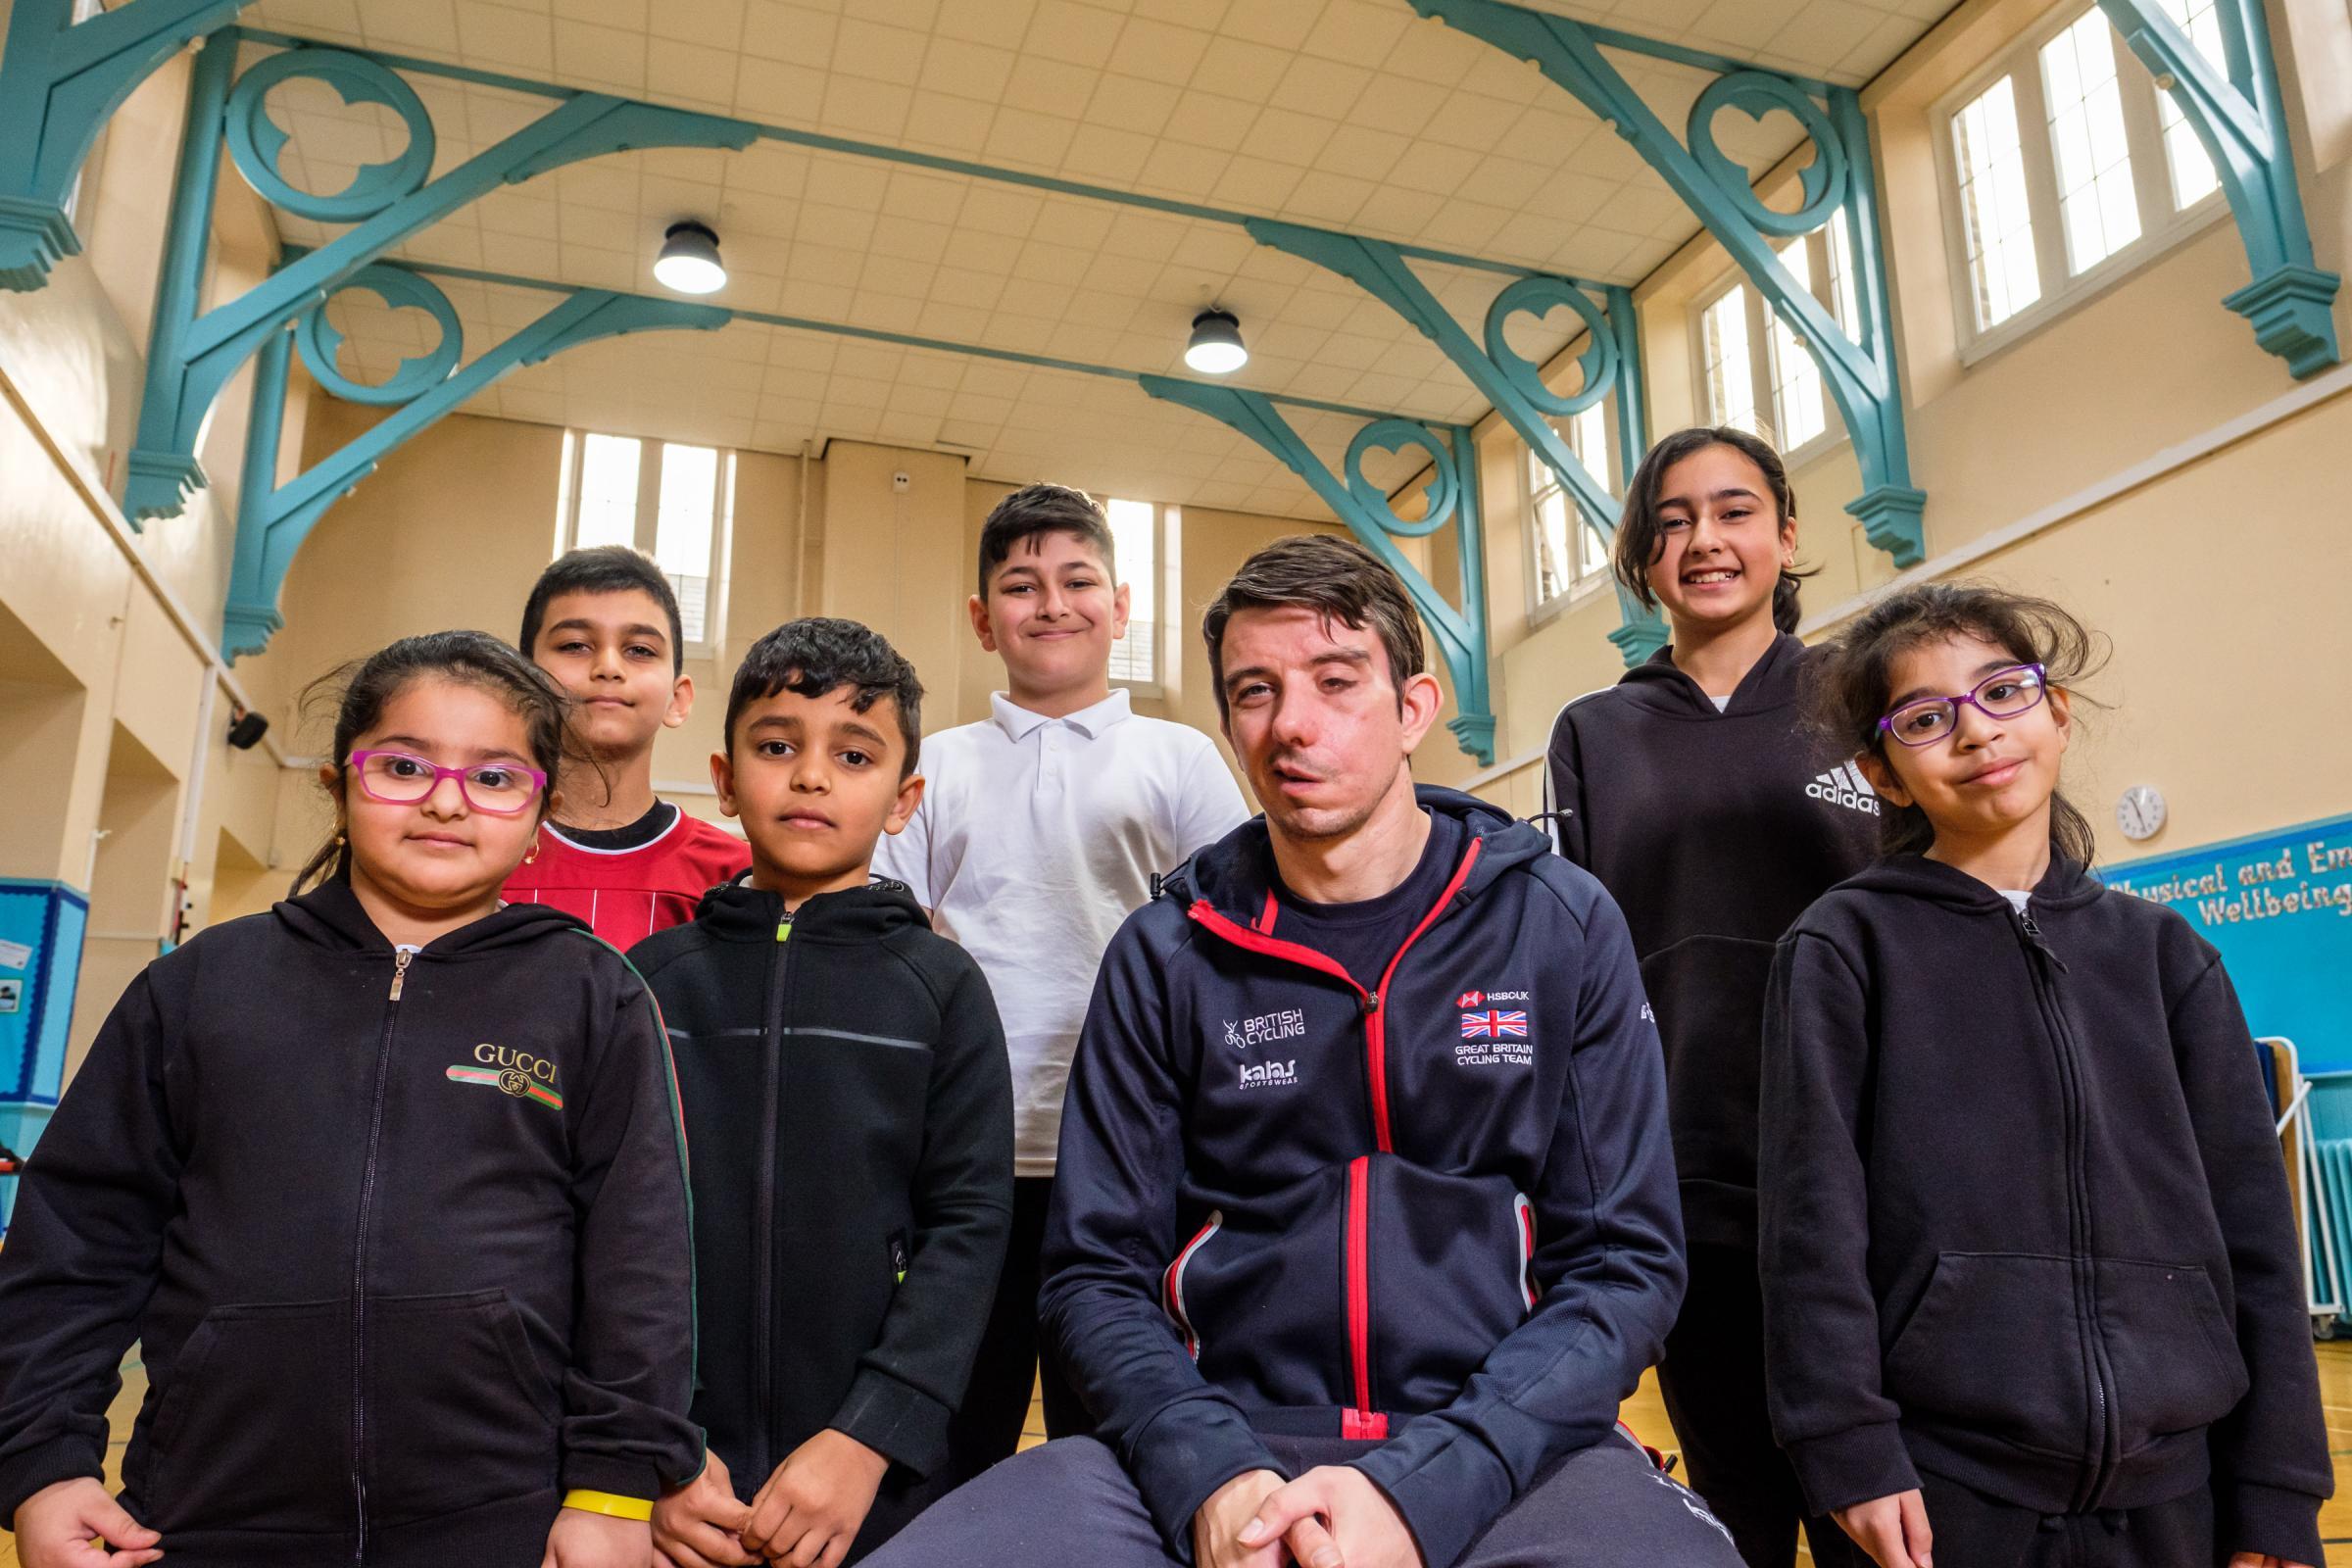 Paralympian Craig McCann inspires Frizinghall Primary School pupils